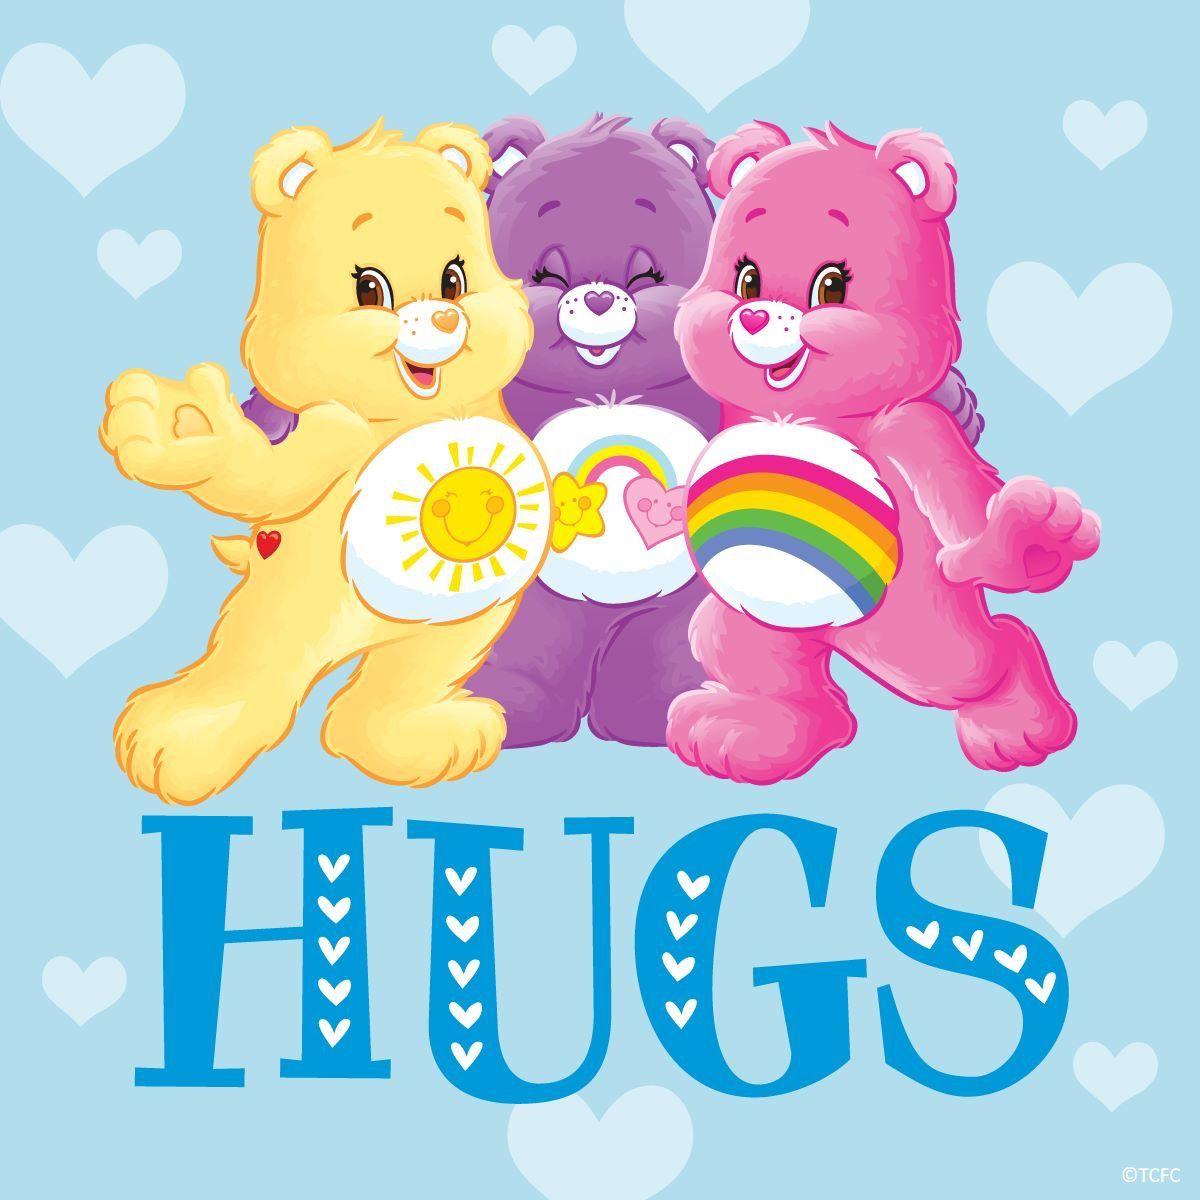 Care bears care bear party care bears cousins care